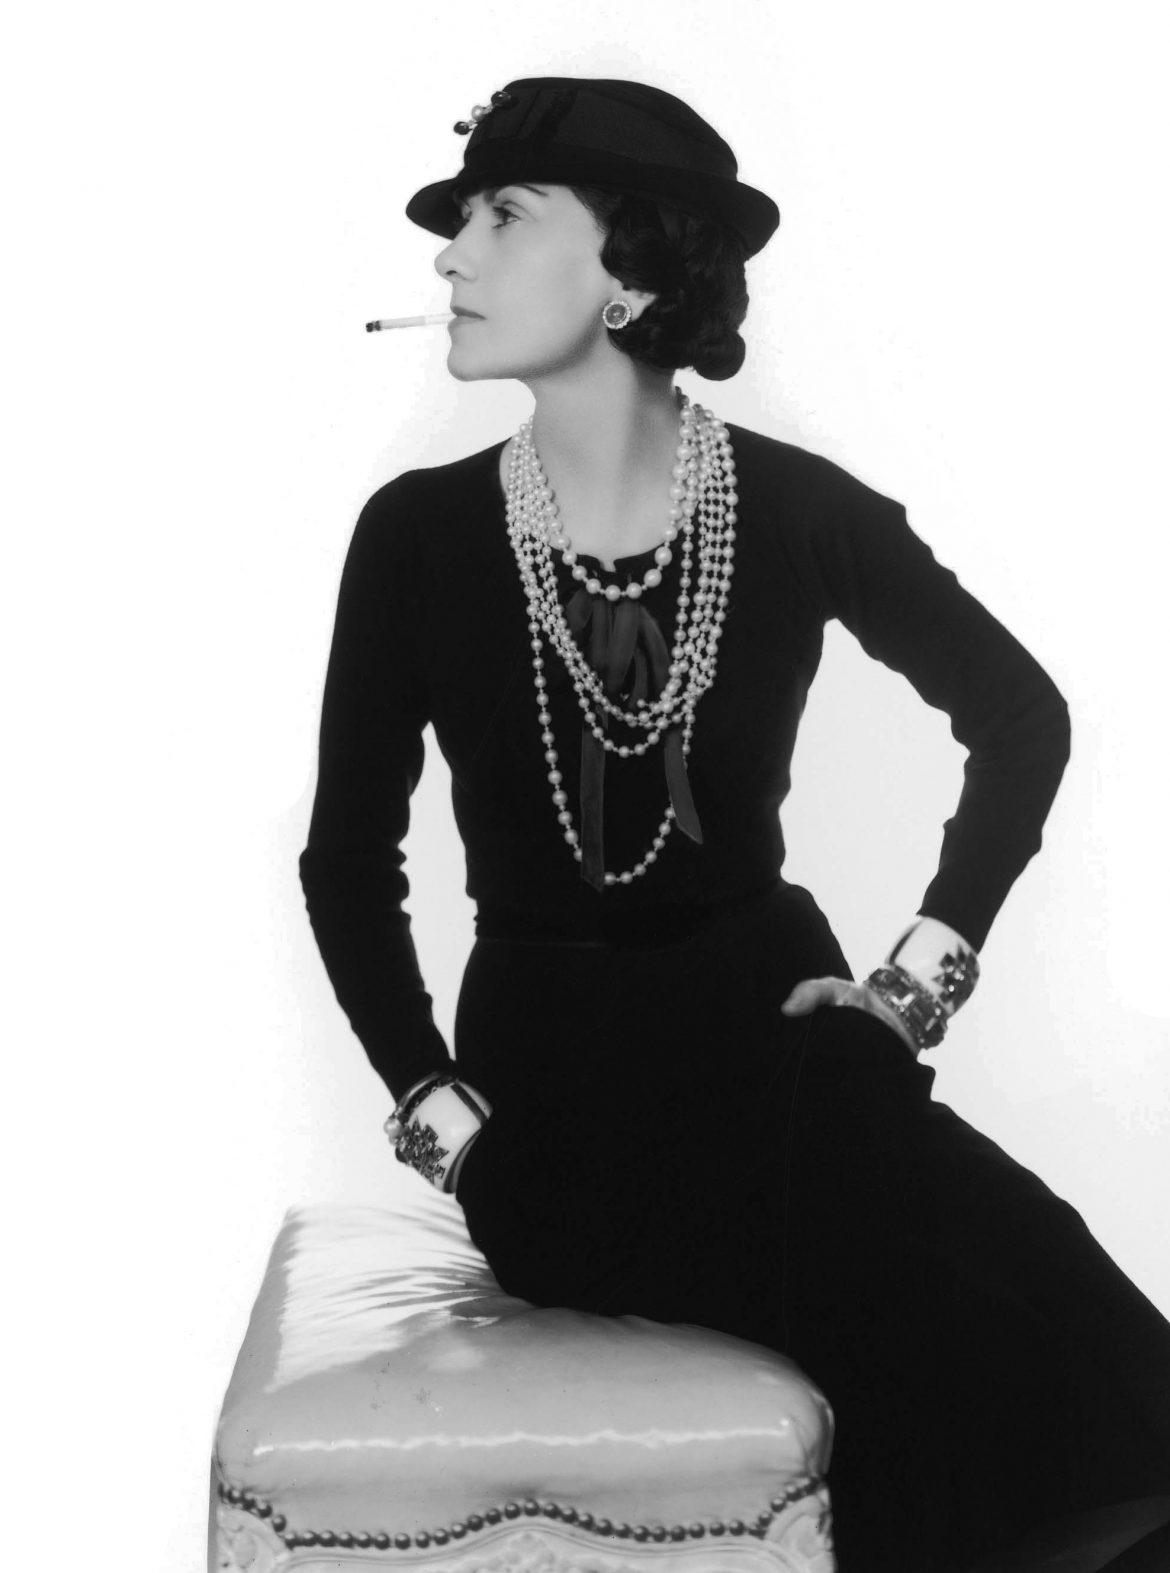 Top Luxury Brands  Chanel  Top Luxury Brands | Chanel Top Luxury Brands Chanel 16